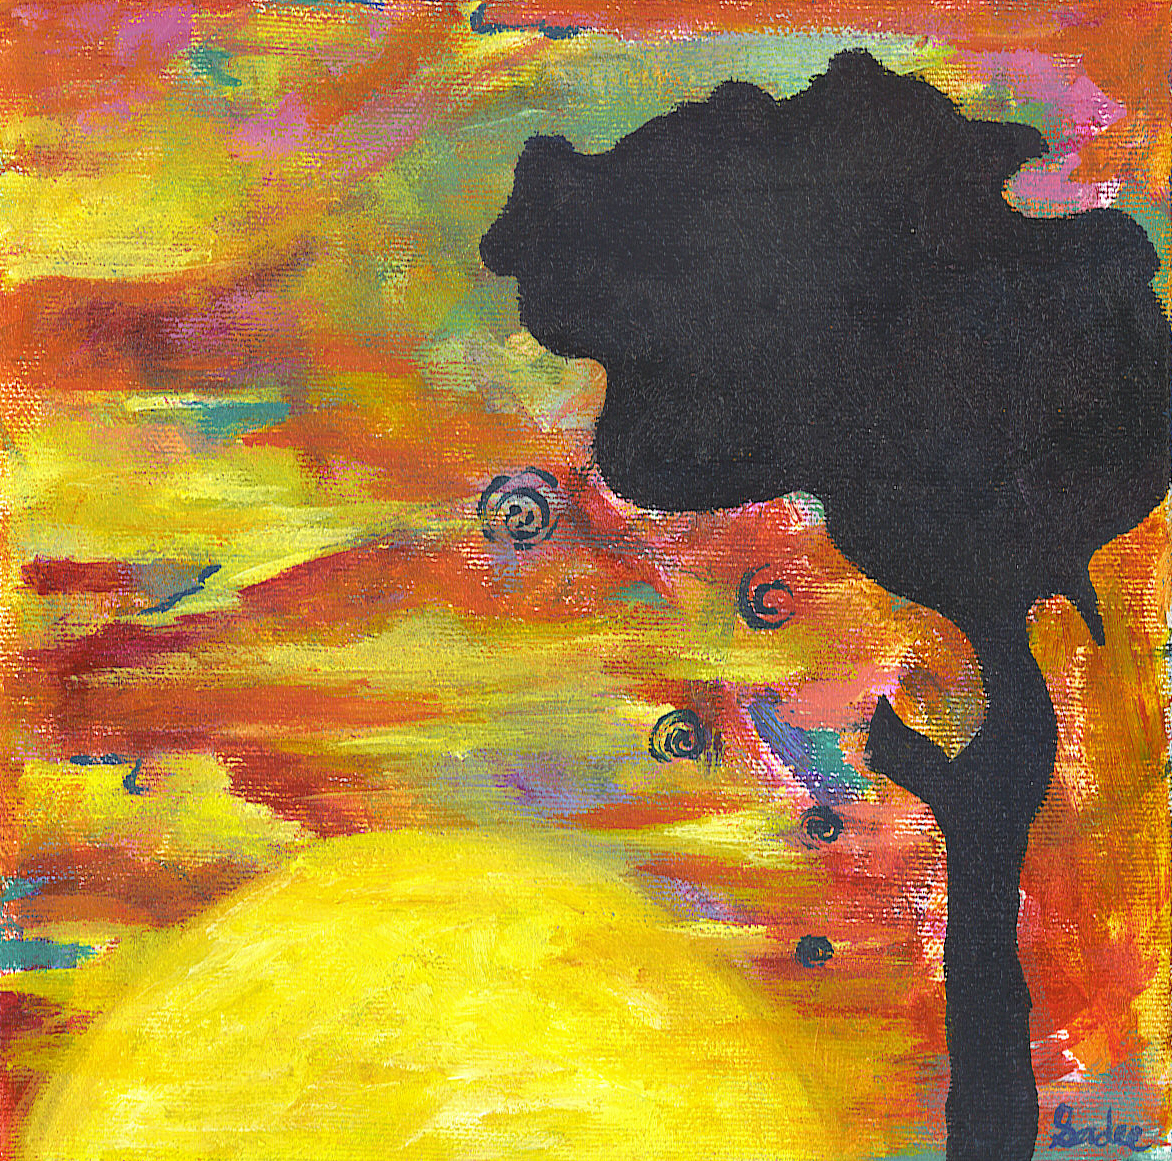 Sunrise Sunset  Acrylic on Canvas 8 x 8 in.